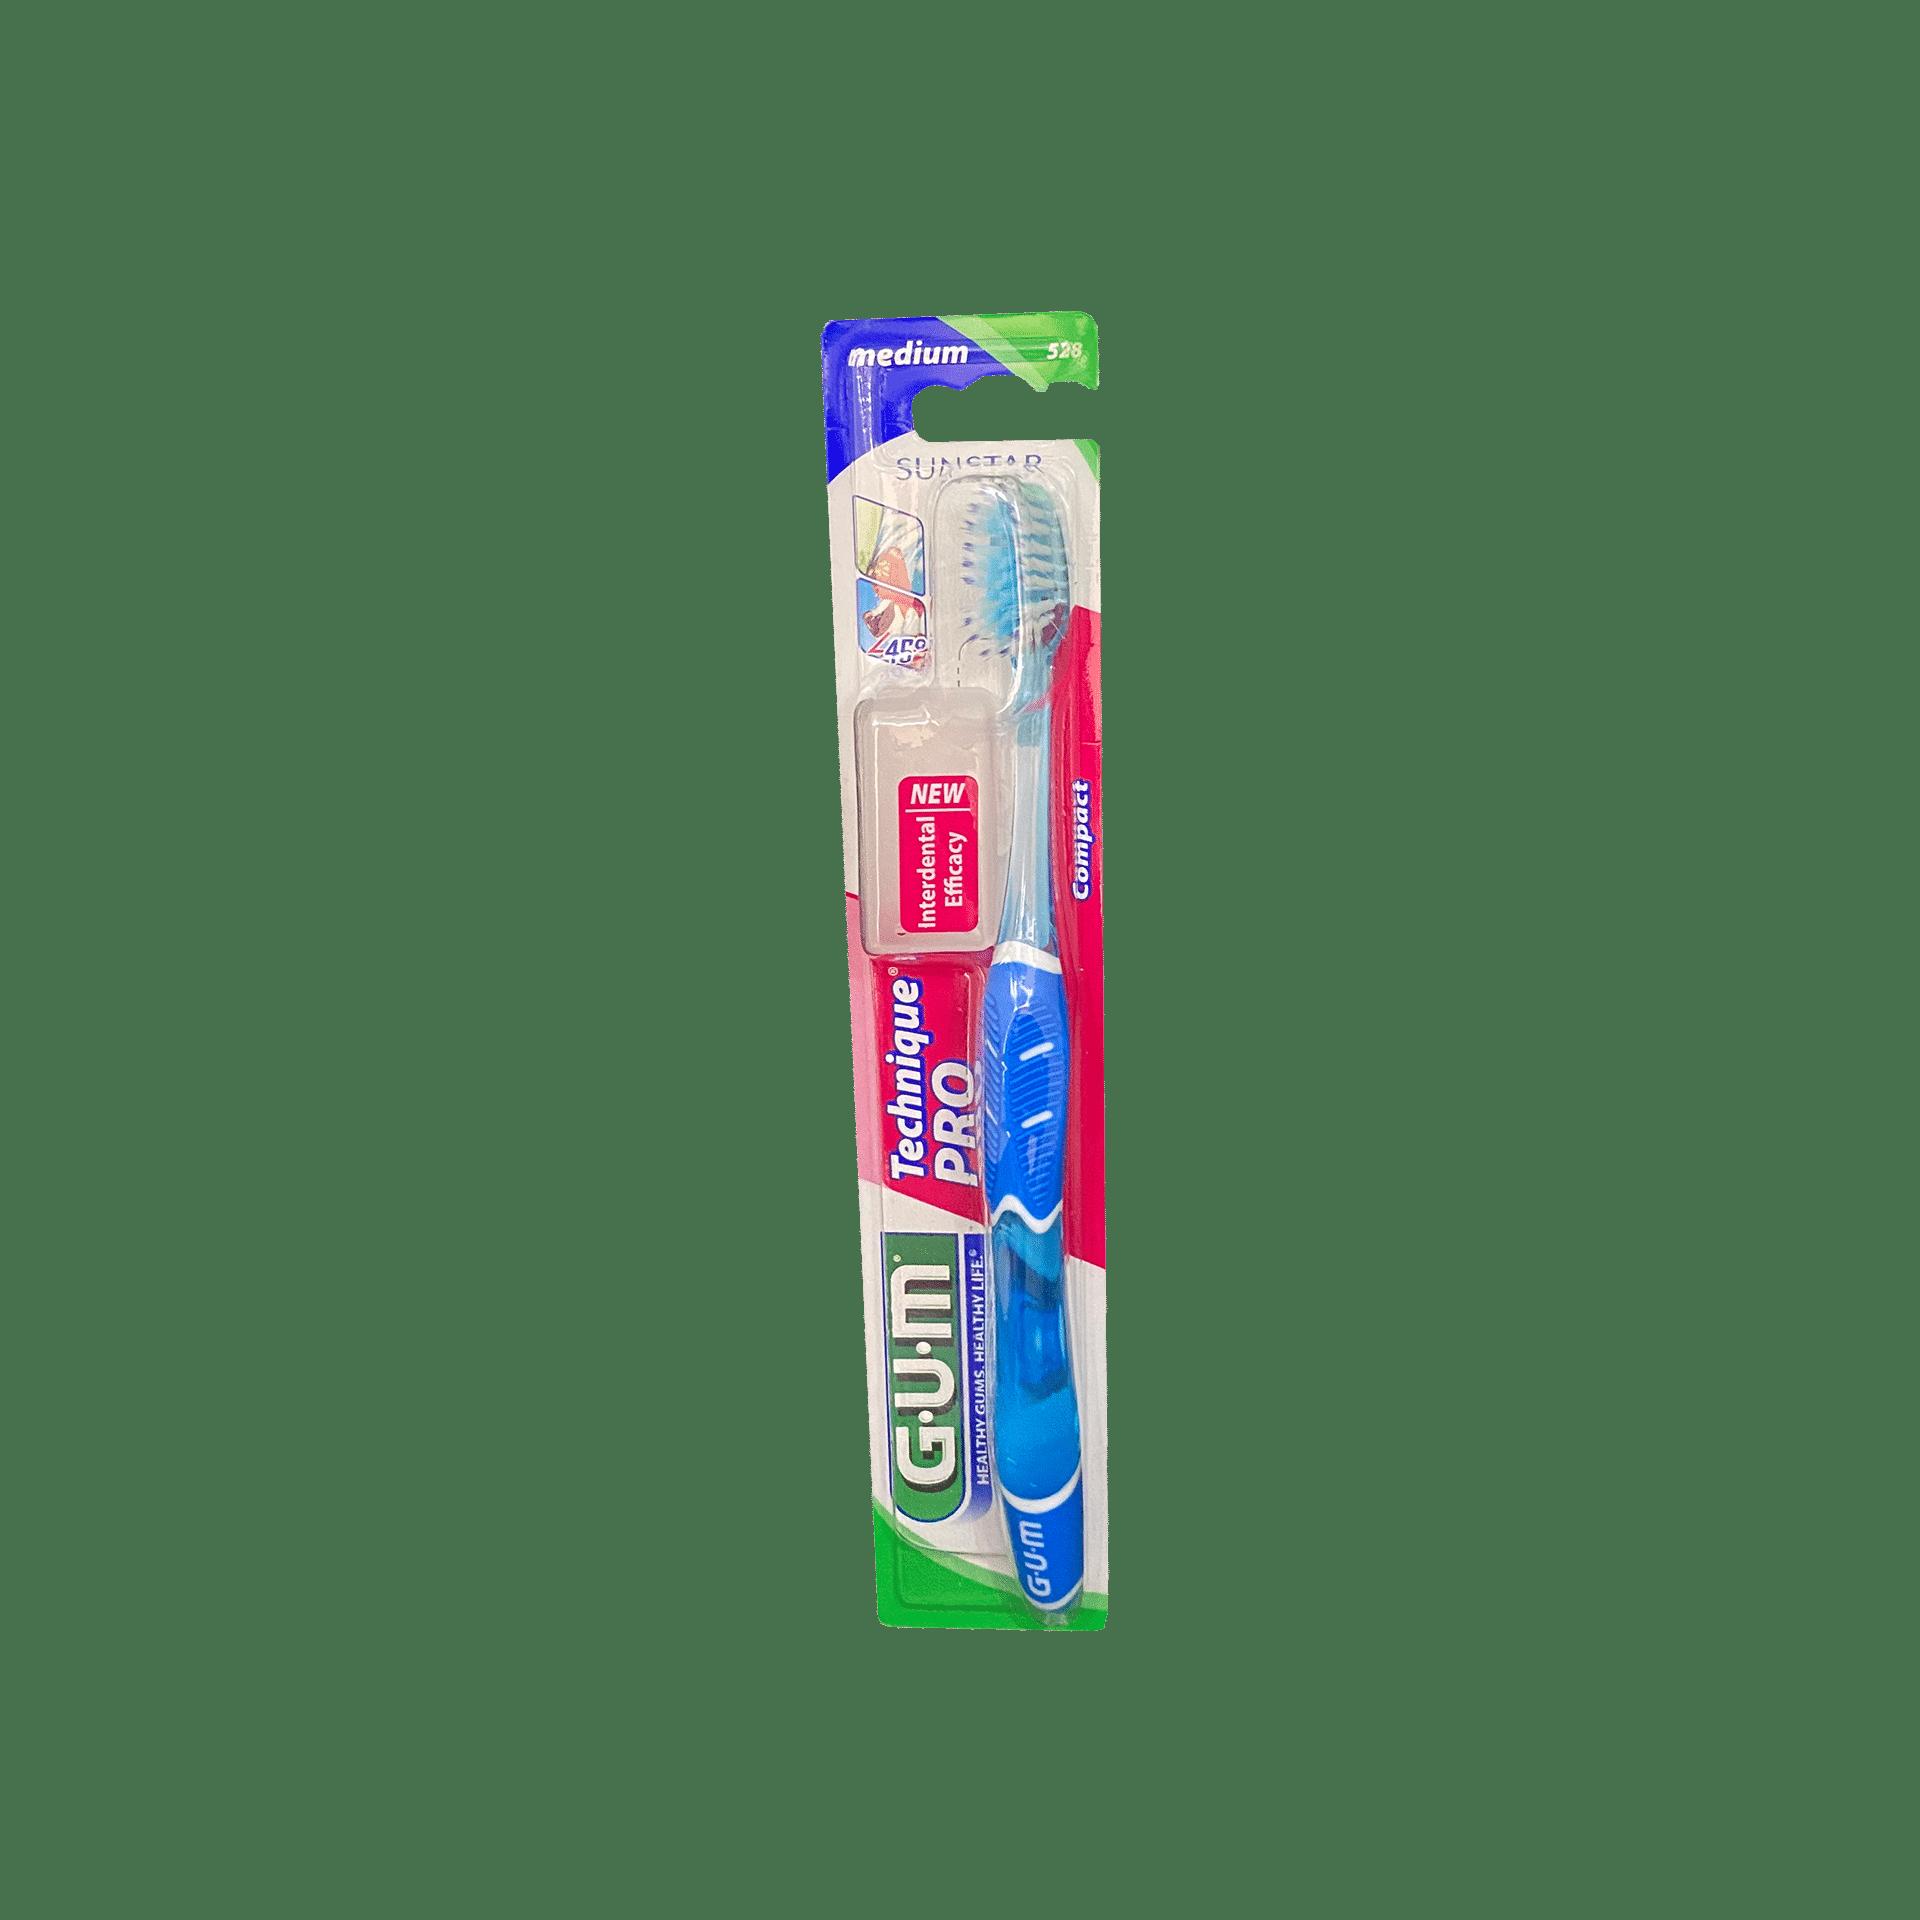 Зубна щітка GUM Technique PRO COMPACT MEDIUM, компактна середньо-м'яка